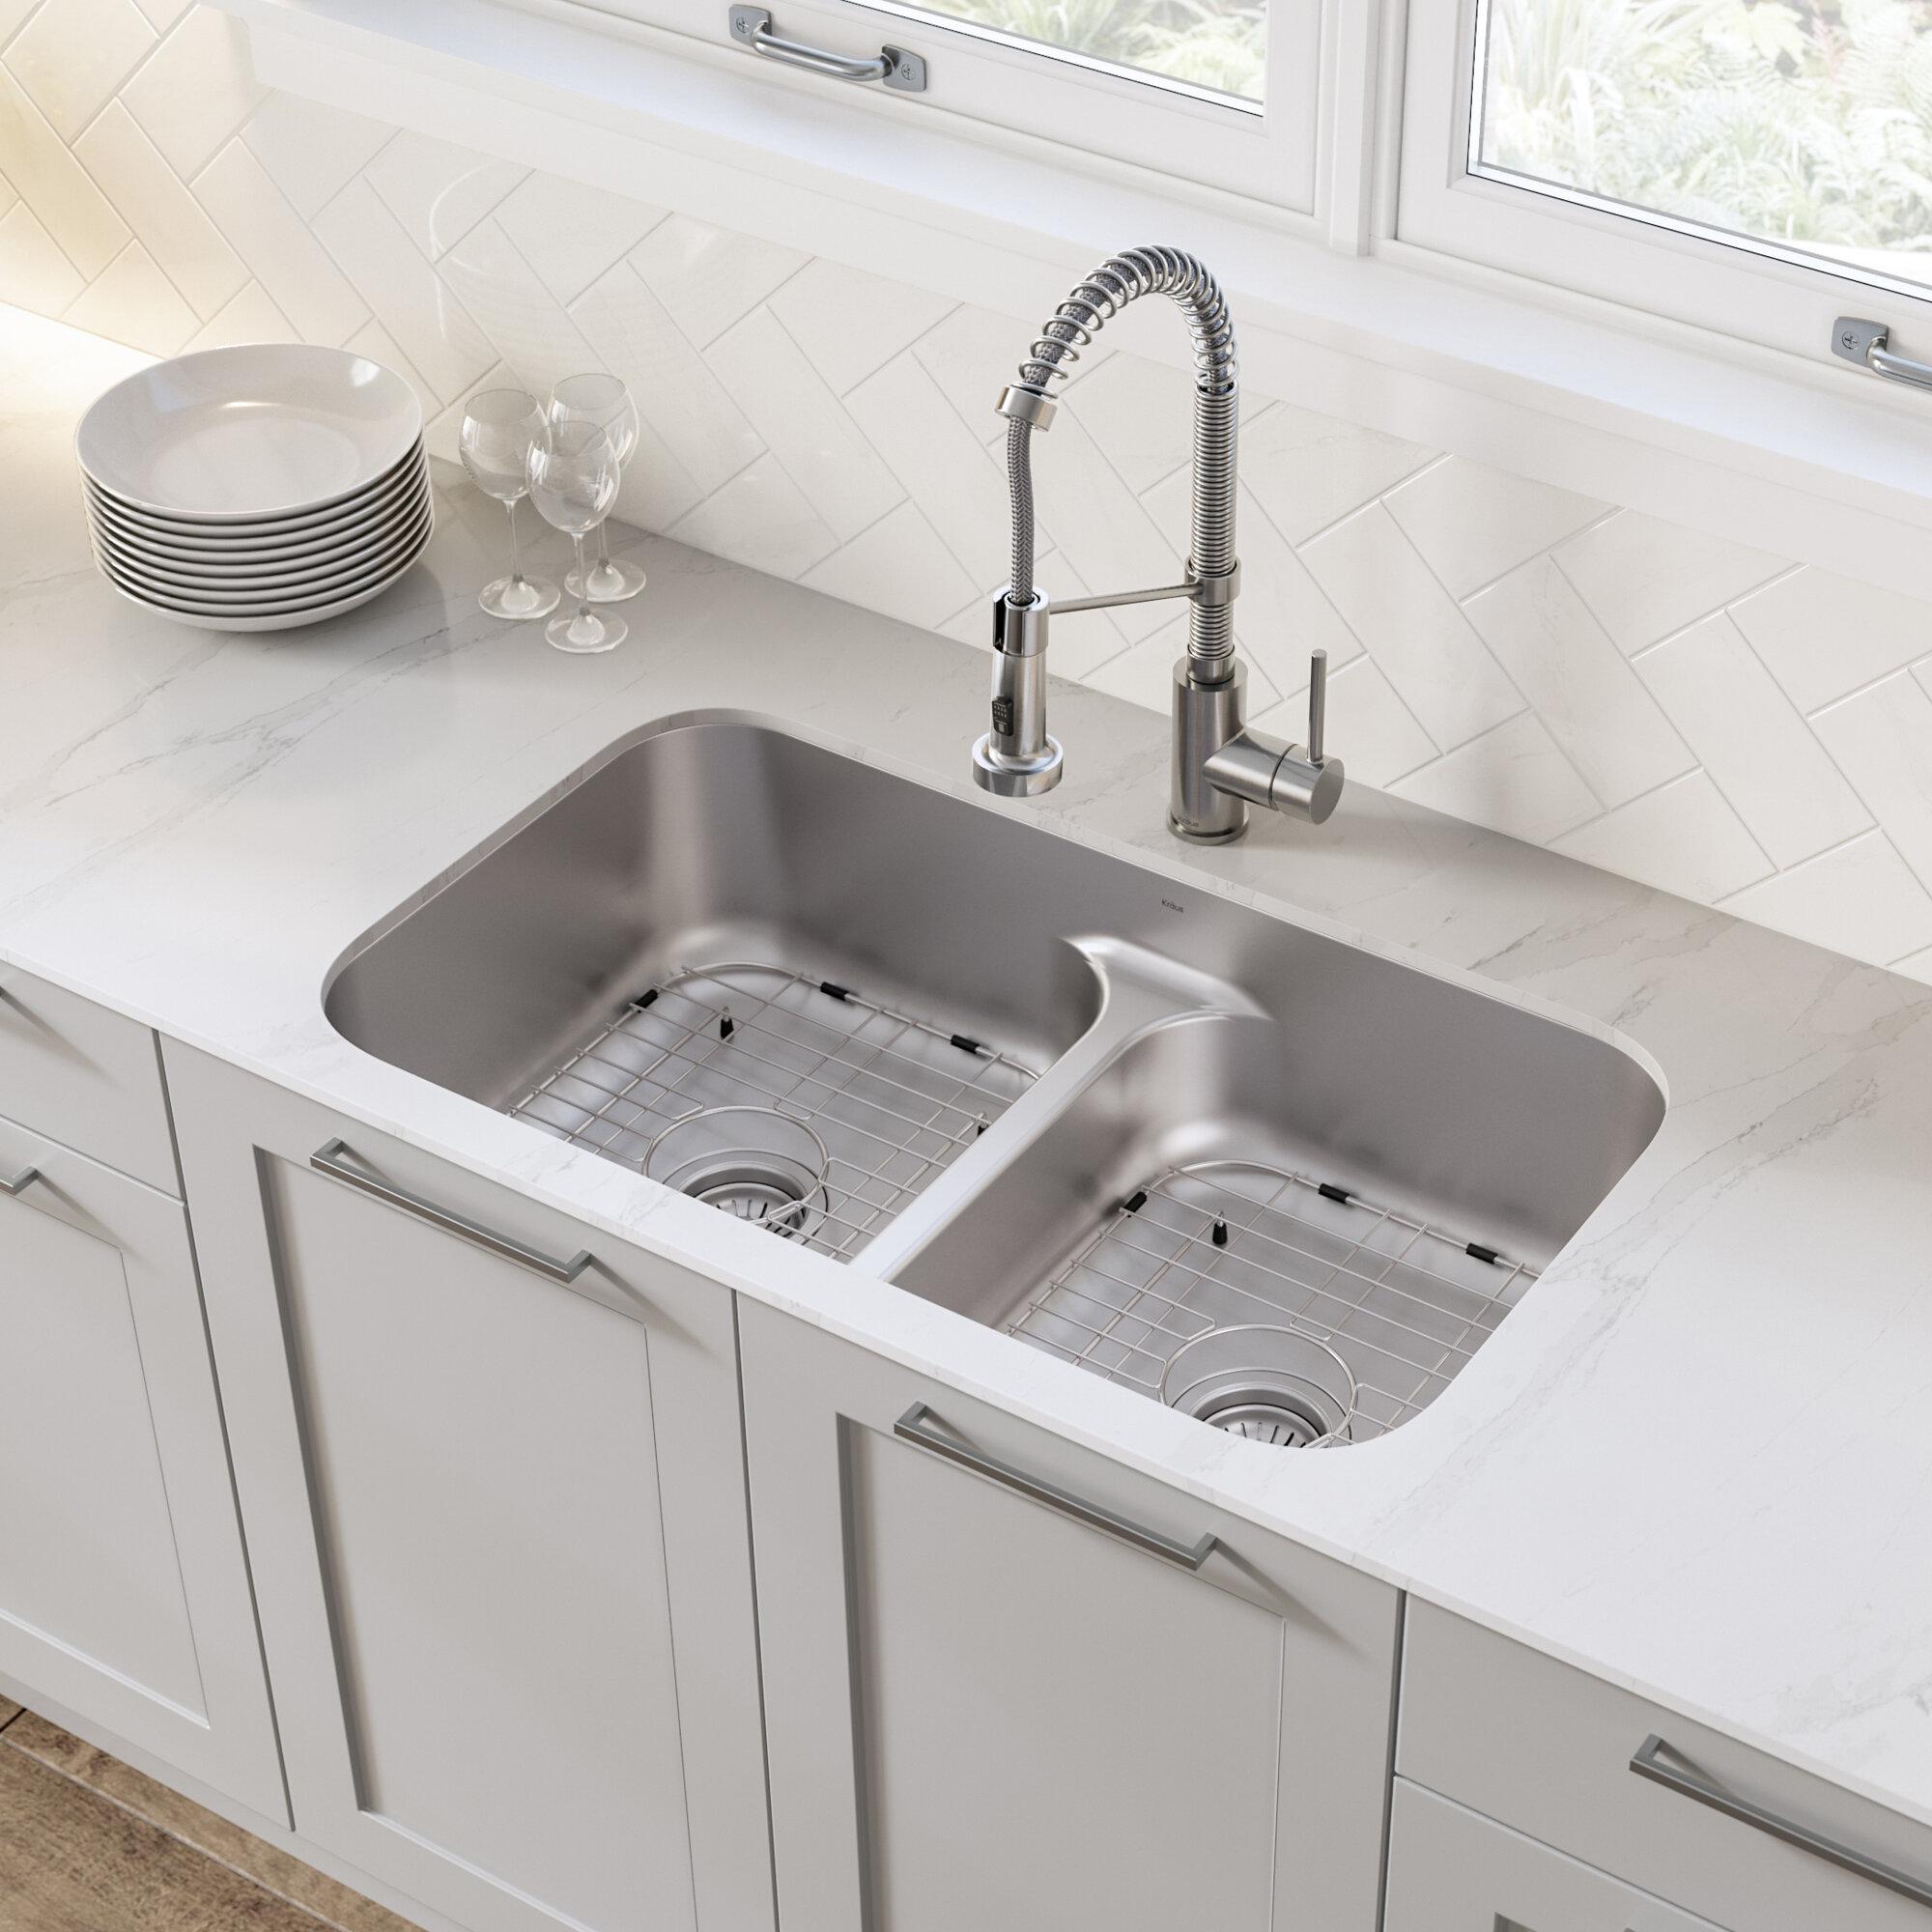 Kraus Ellis 32 L X 18 W Double Basin Undermount Kitchen Sink With Faucet Reviews Wayfair